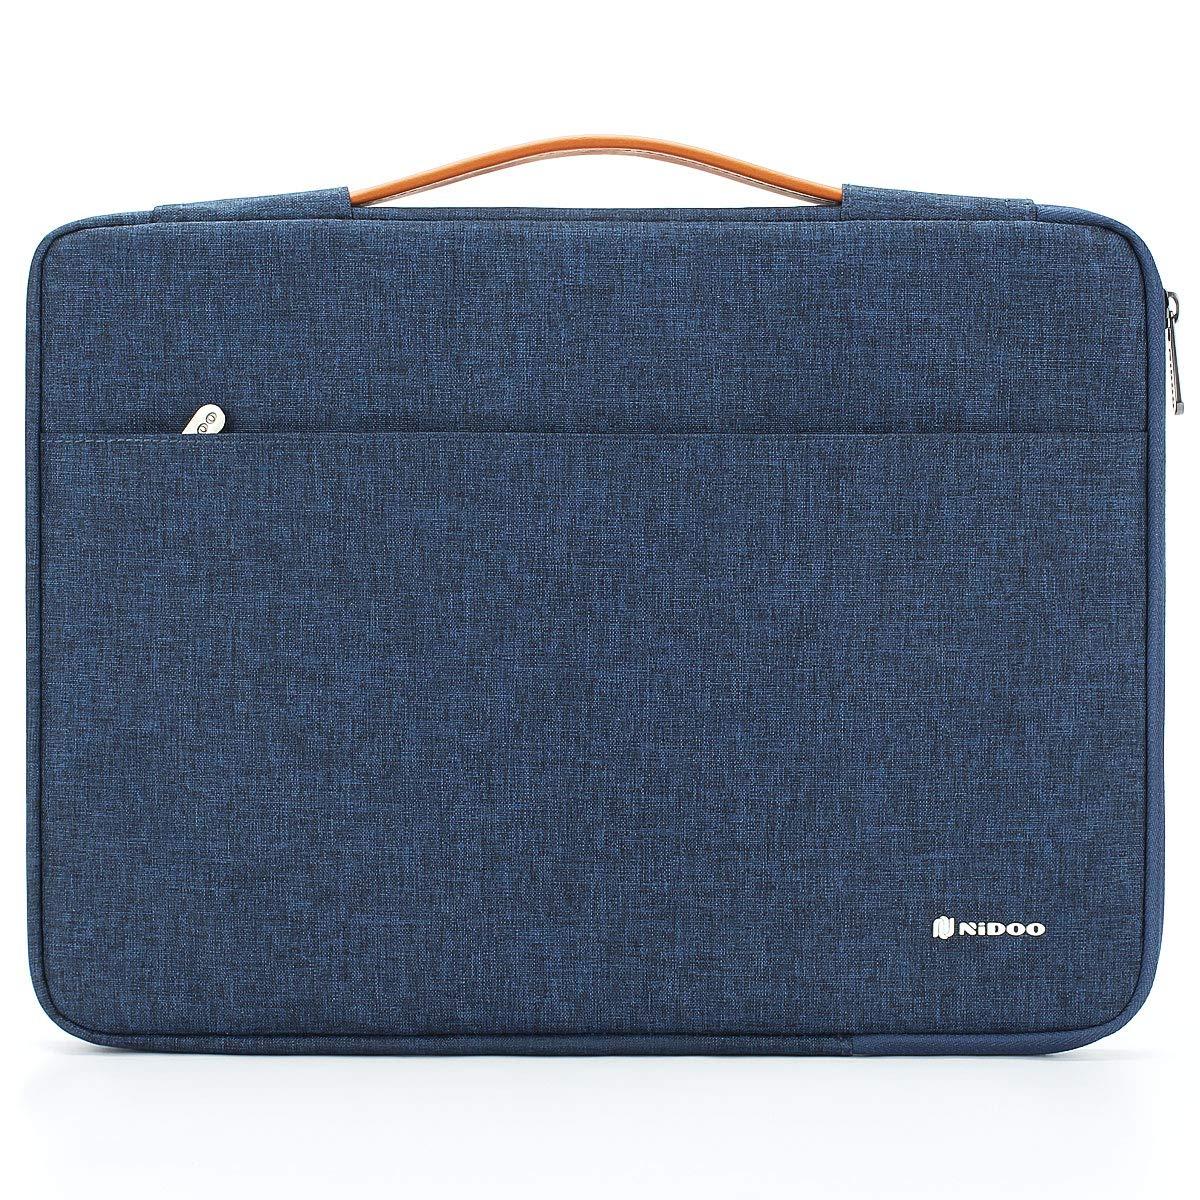 12.3 Surface Pro 6 4 7 13 Huawei MateBook 13 2020 NIDOO 11 Laptop Sleeve case Notebook Bag Protective Handbag for 12.9 iPad Pro 2018//13 MacBook Air 2018//13 MacBook Pro Touch Bar Blue